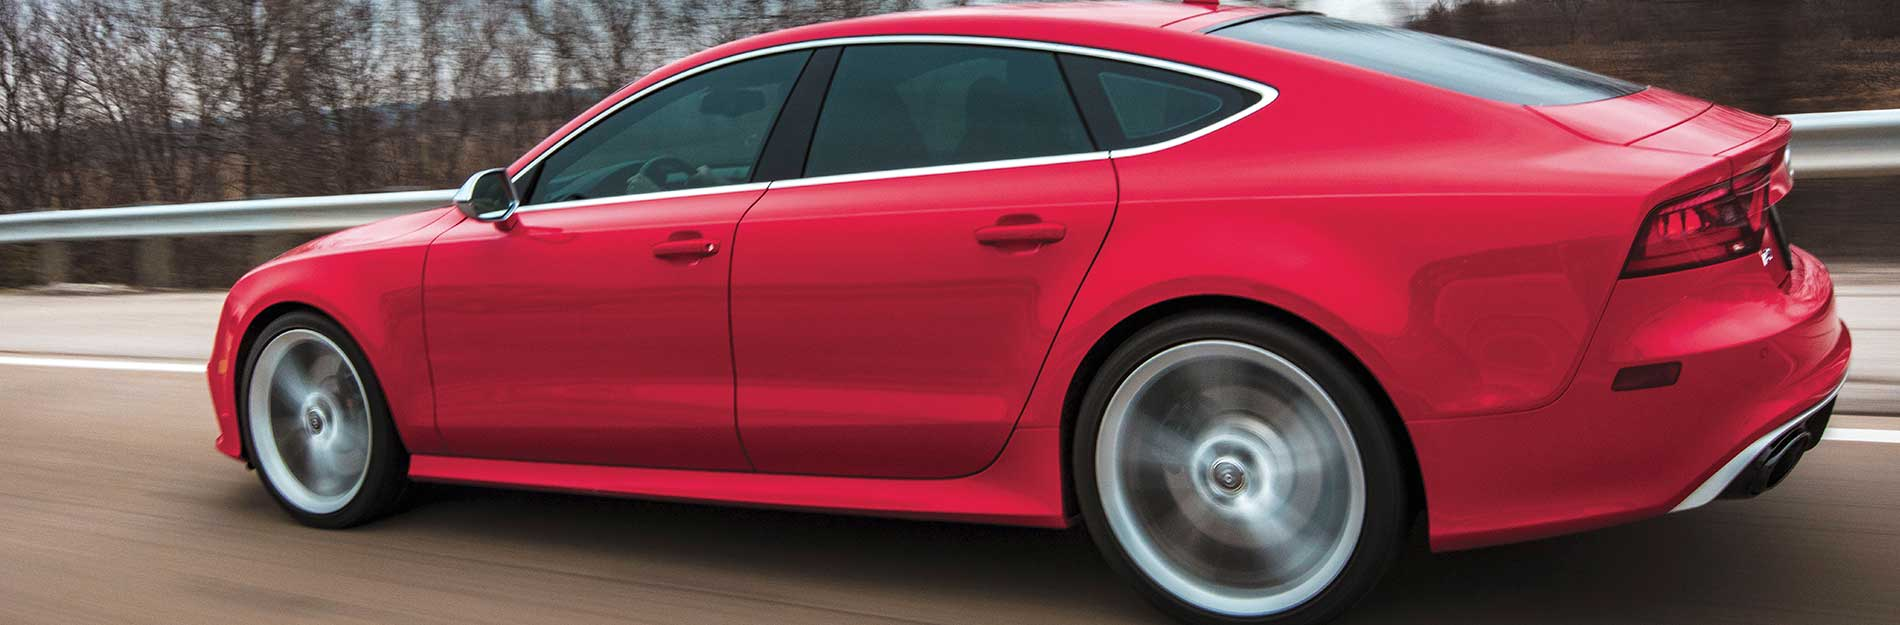 Red Car Tinted Windows   Kar Kraft Automotive